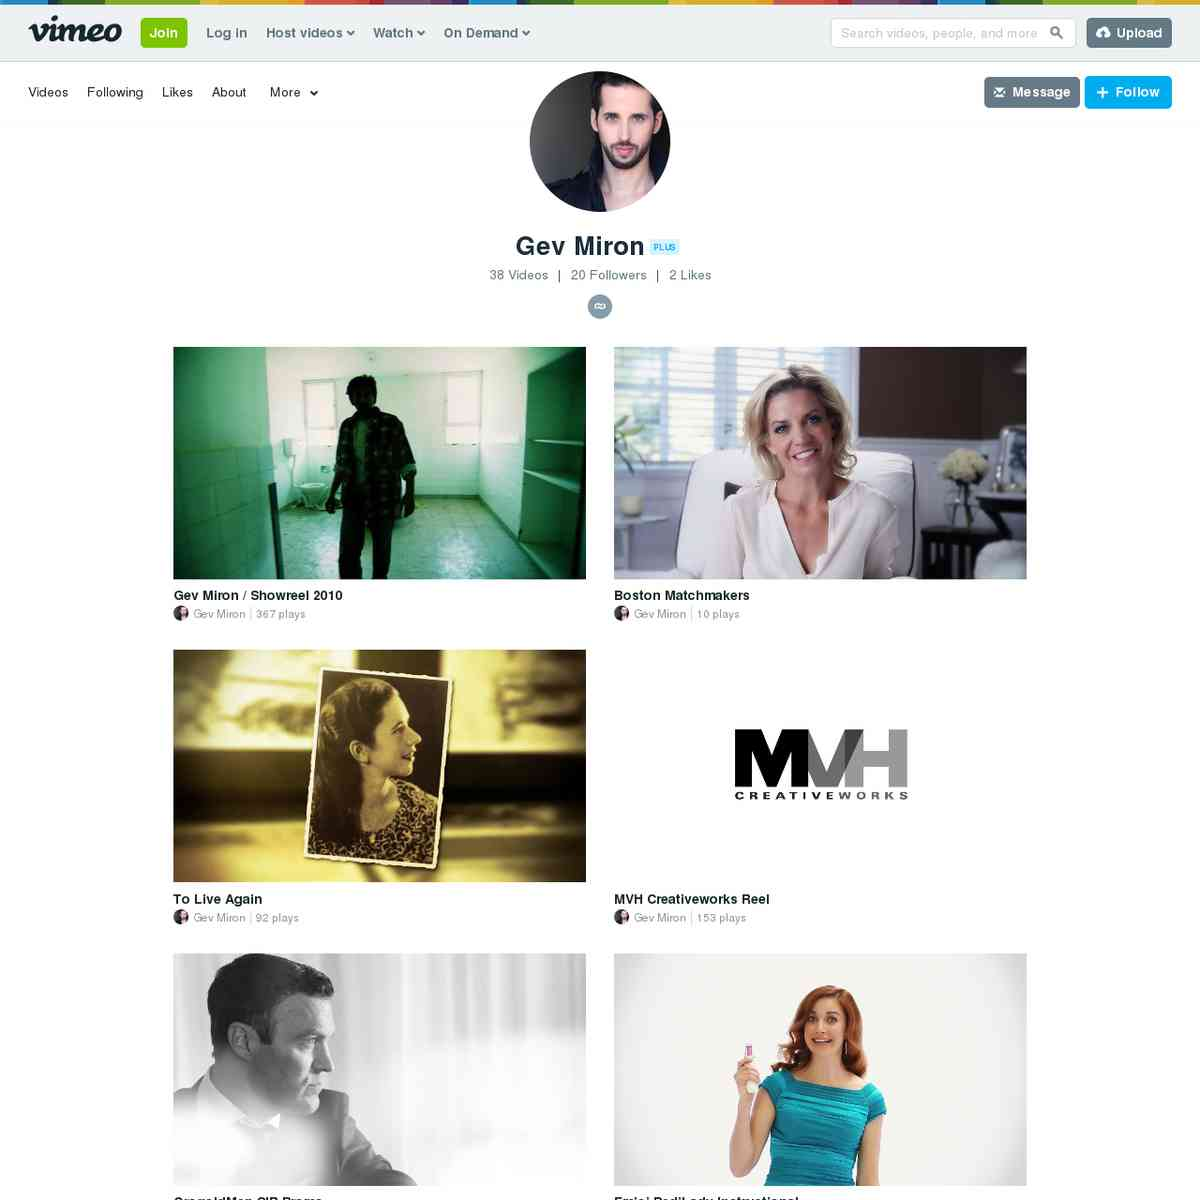 vimeo.com/gevmiron